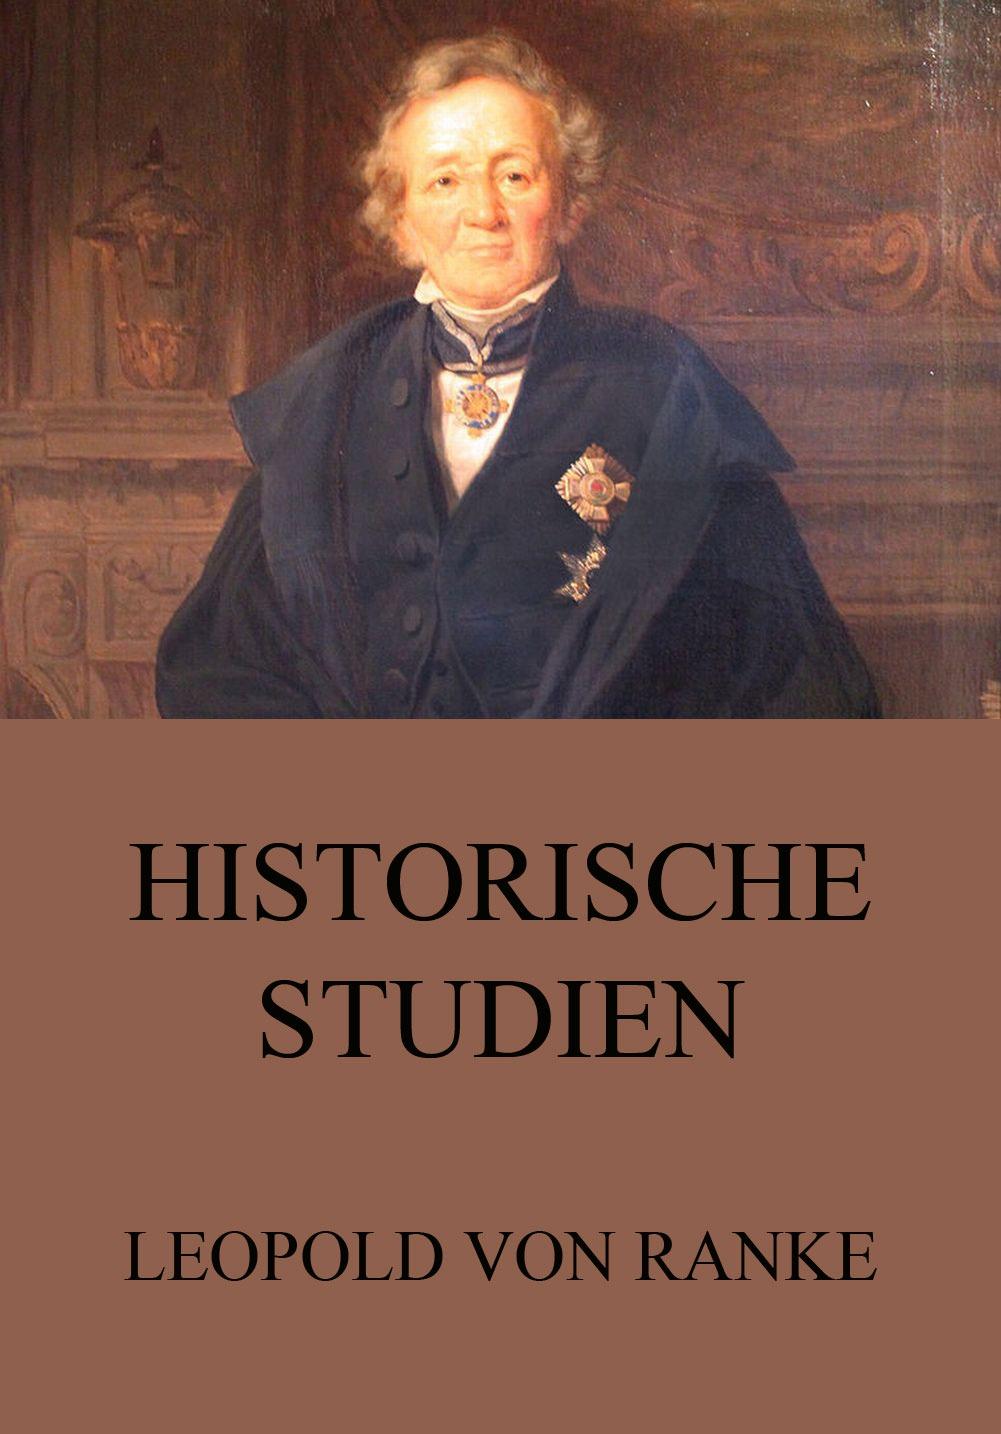 Leopold von Ranke Historische Studien jorissen theodoor historische studien volume 4 dutch edition